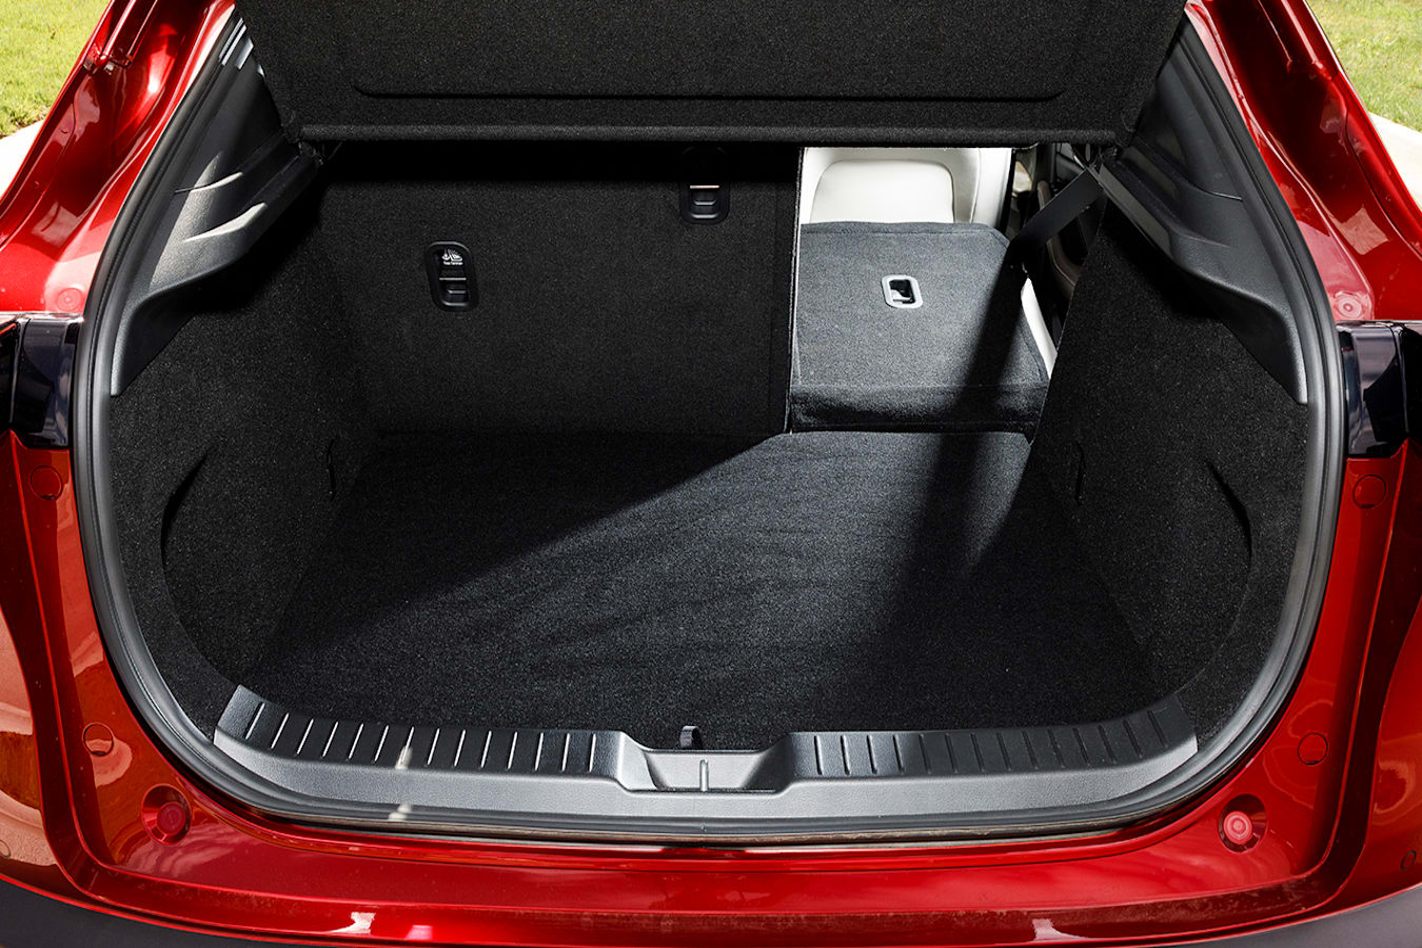 Mazda CX-30 boot space